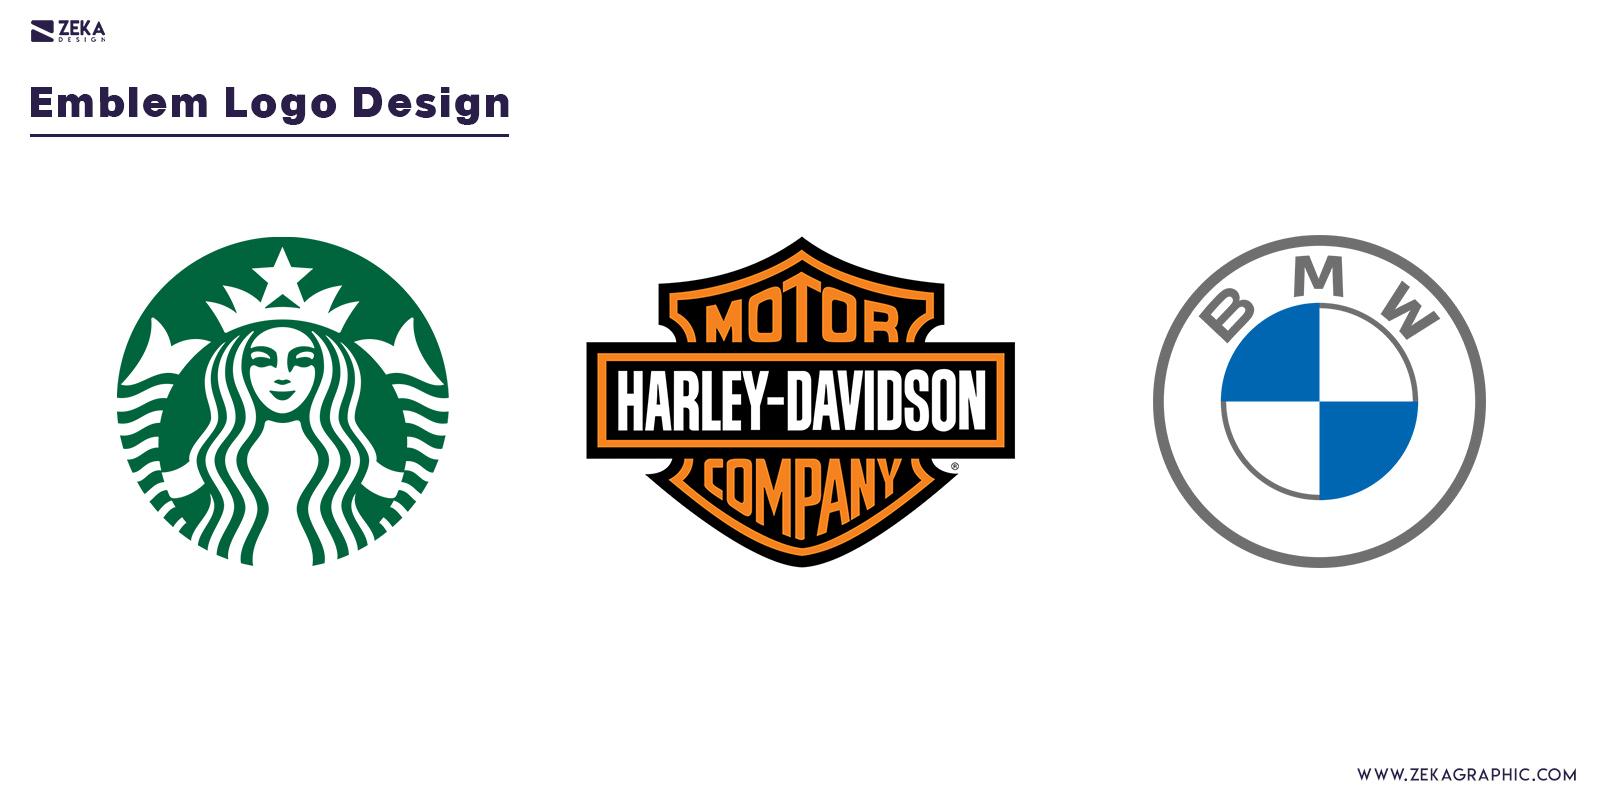 Emblem Logo Design Type Graphic Design Blog Inspiration